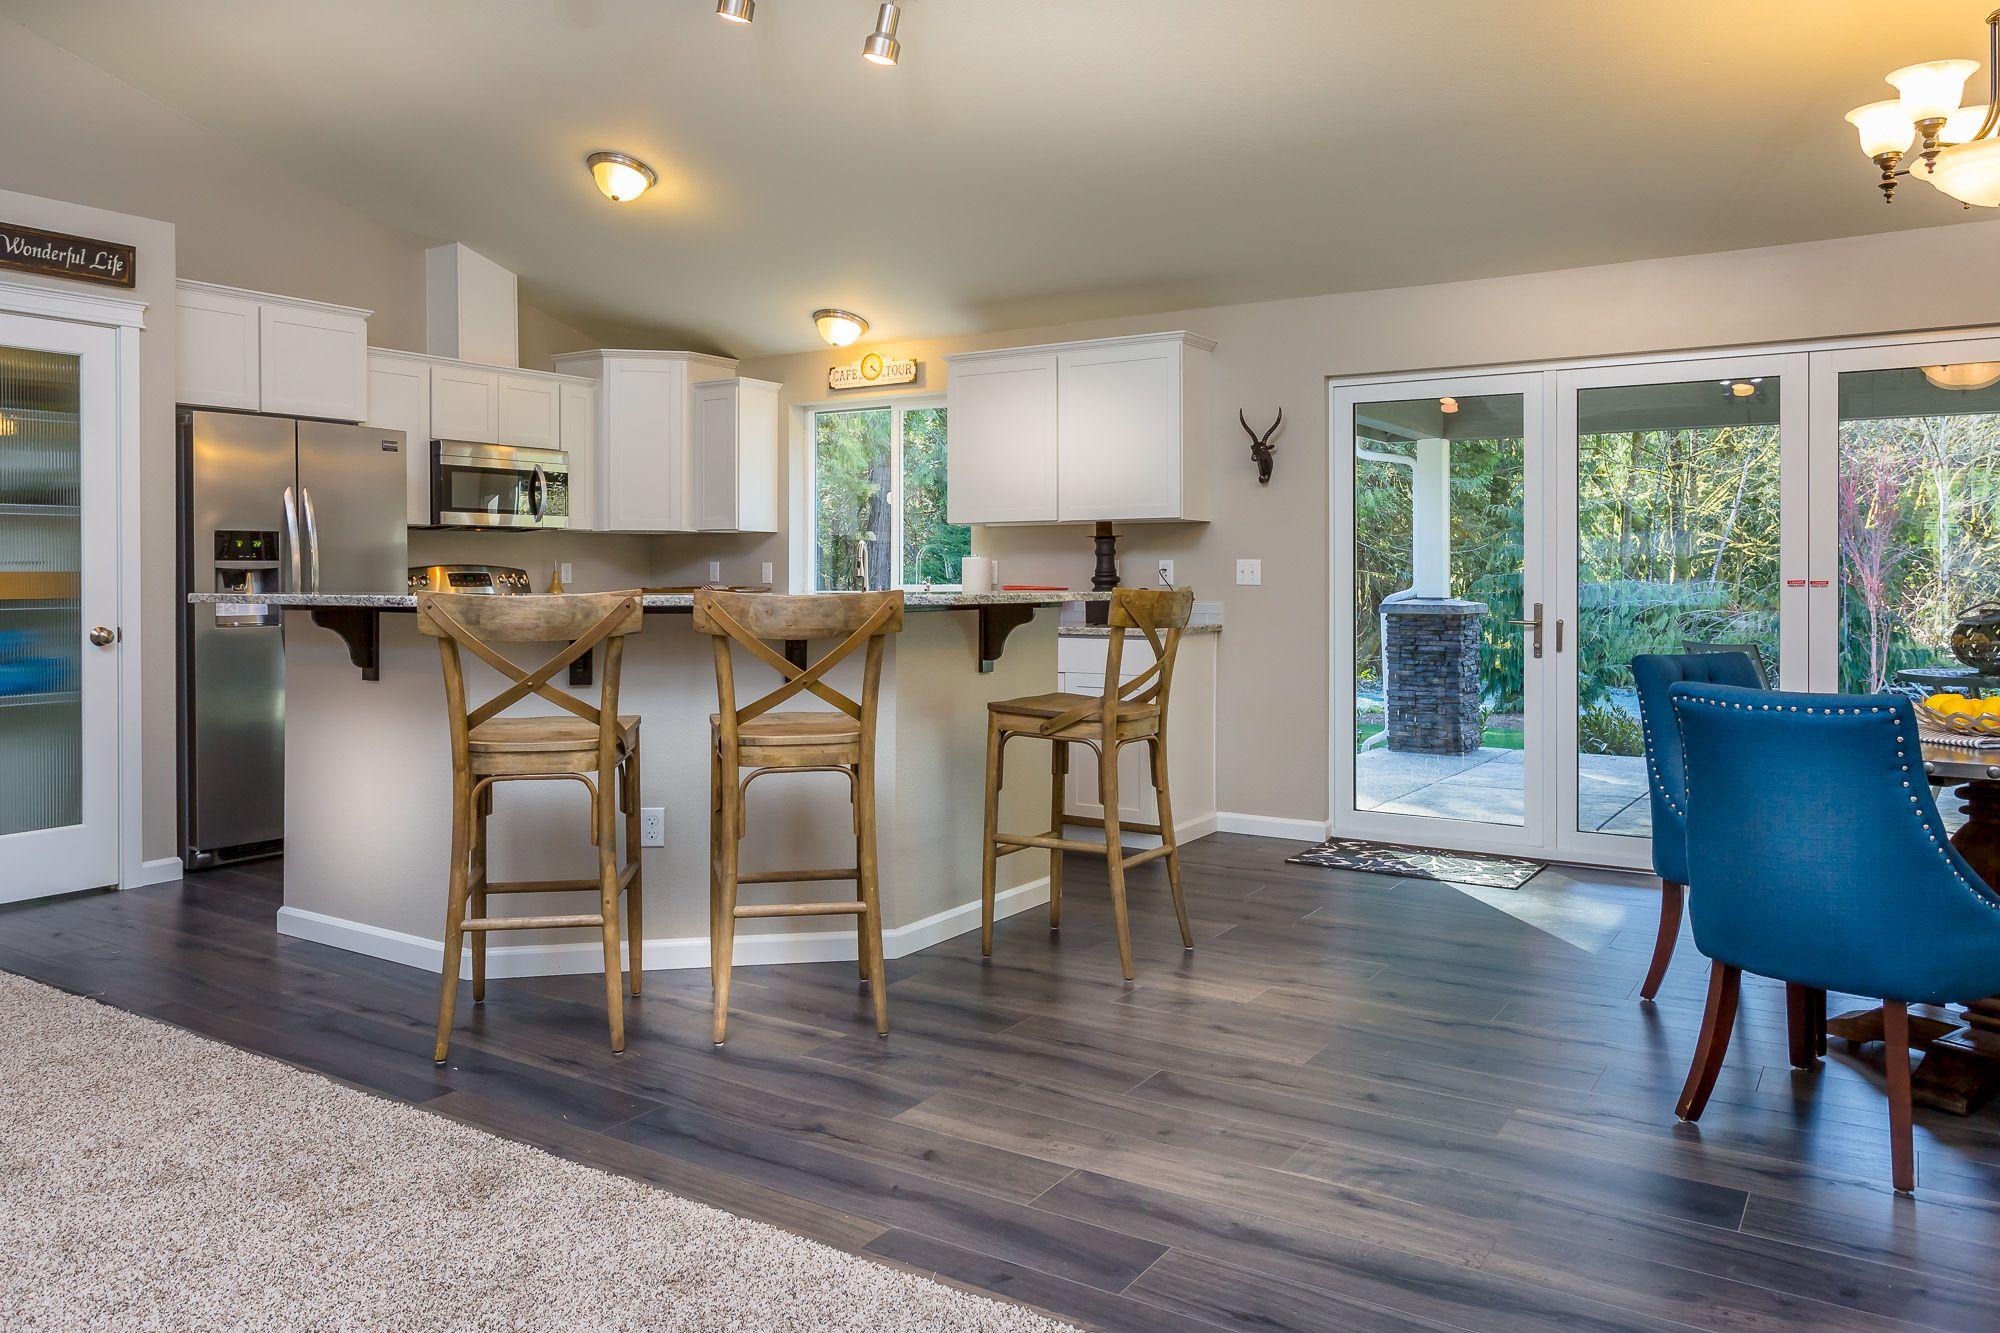 Gallery 2232 floor plan hiline homes favorite for Hiline homes floor plans